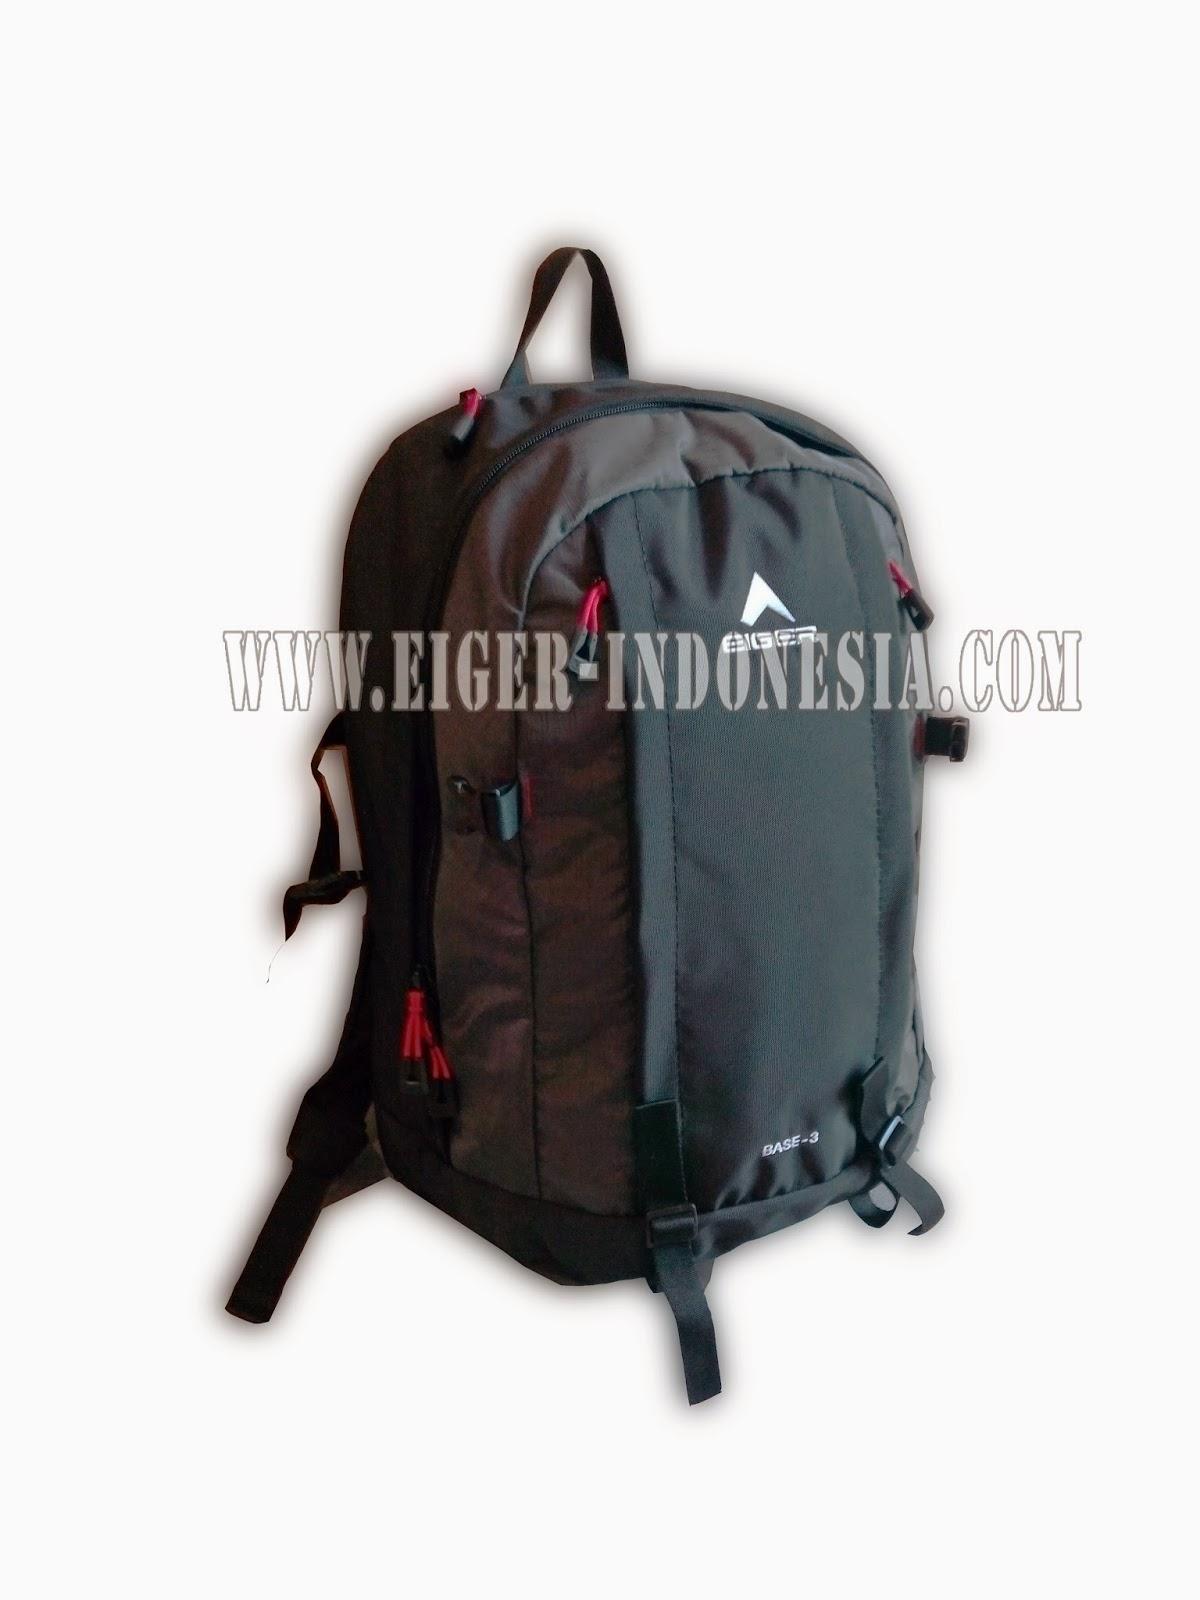 http://www.eiger-indonesia.com/2014/11/tas-eiger-2263-base-4.html